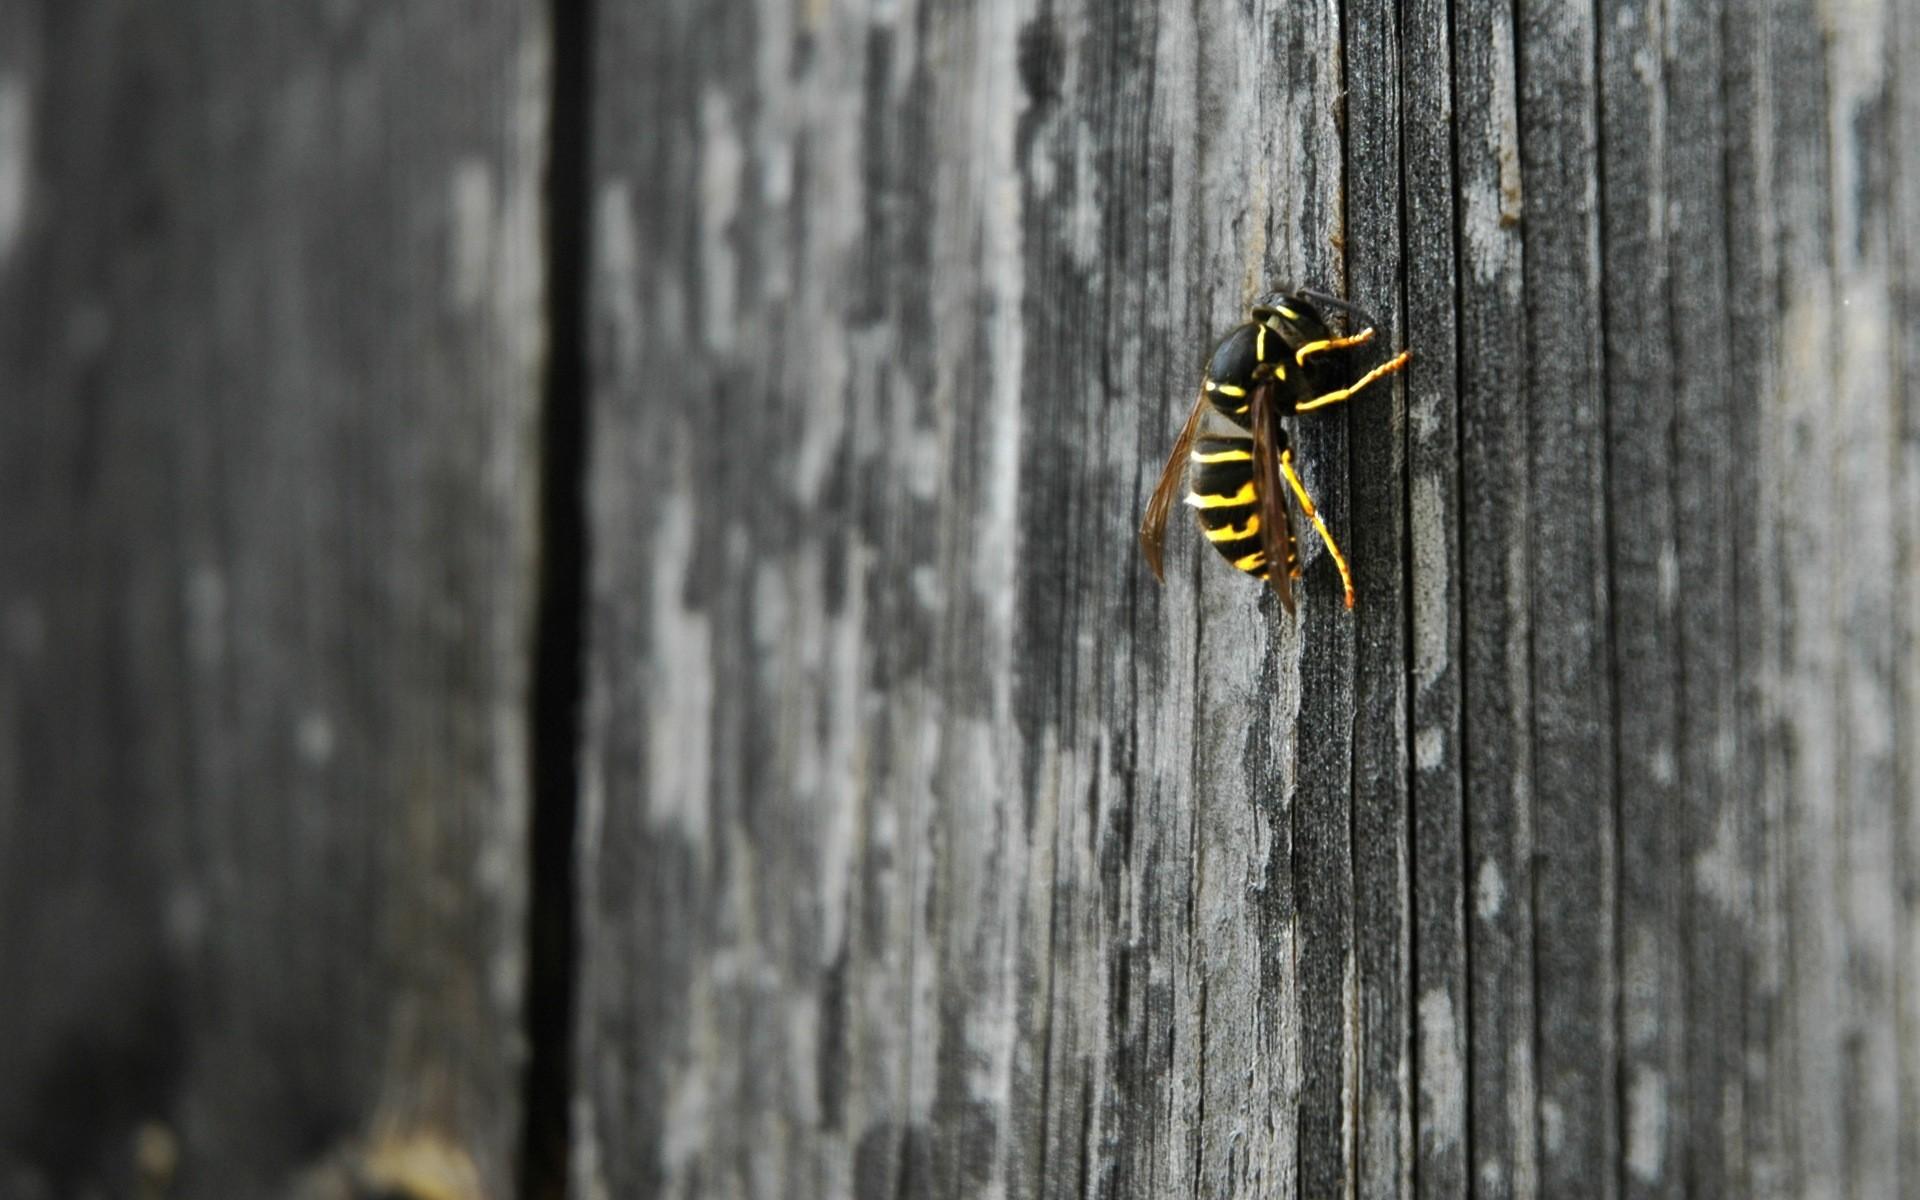 пчела, ползет, лапки